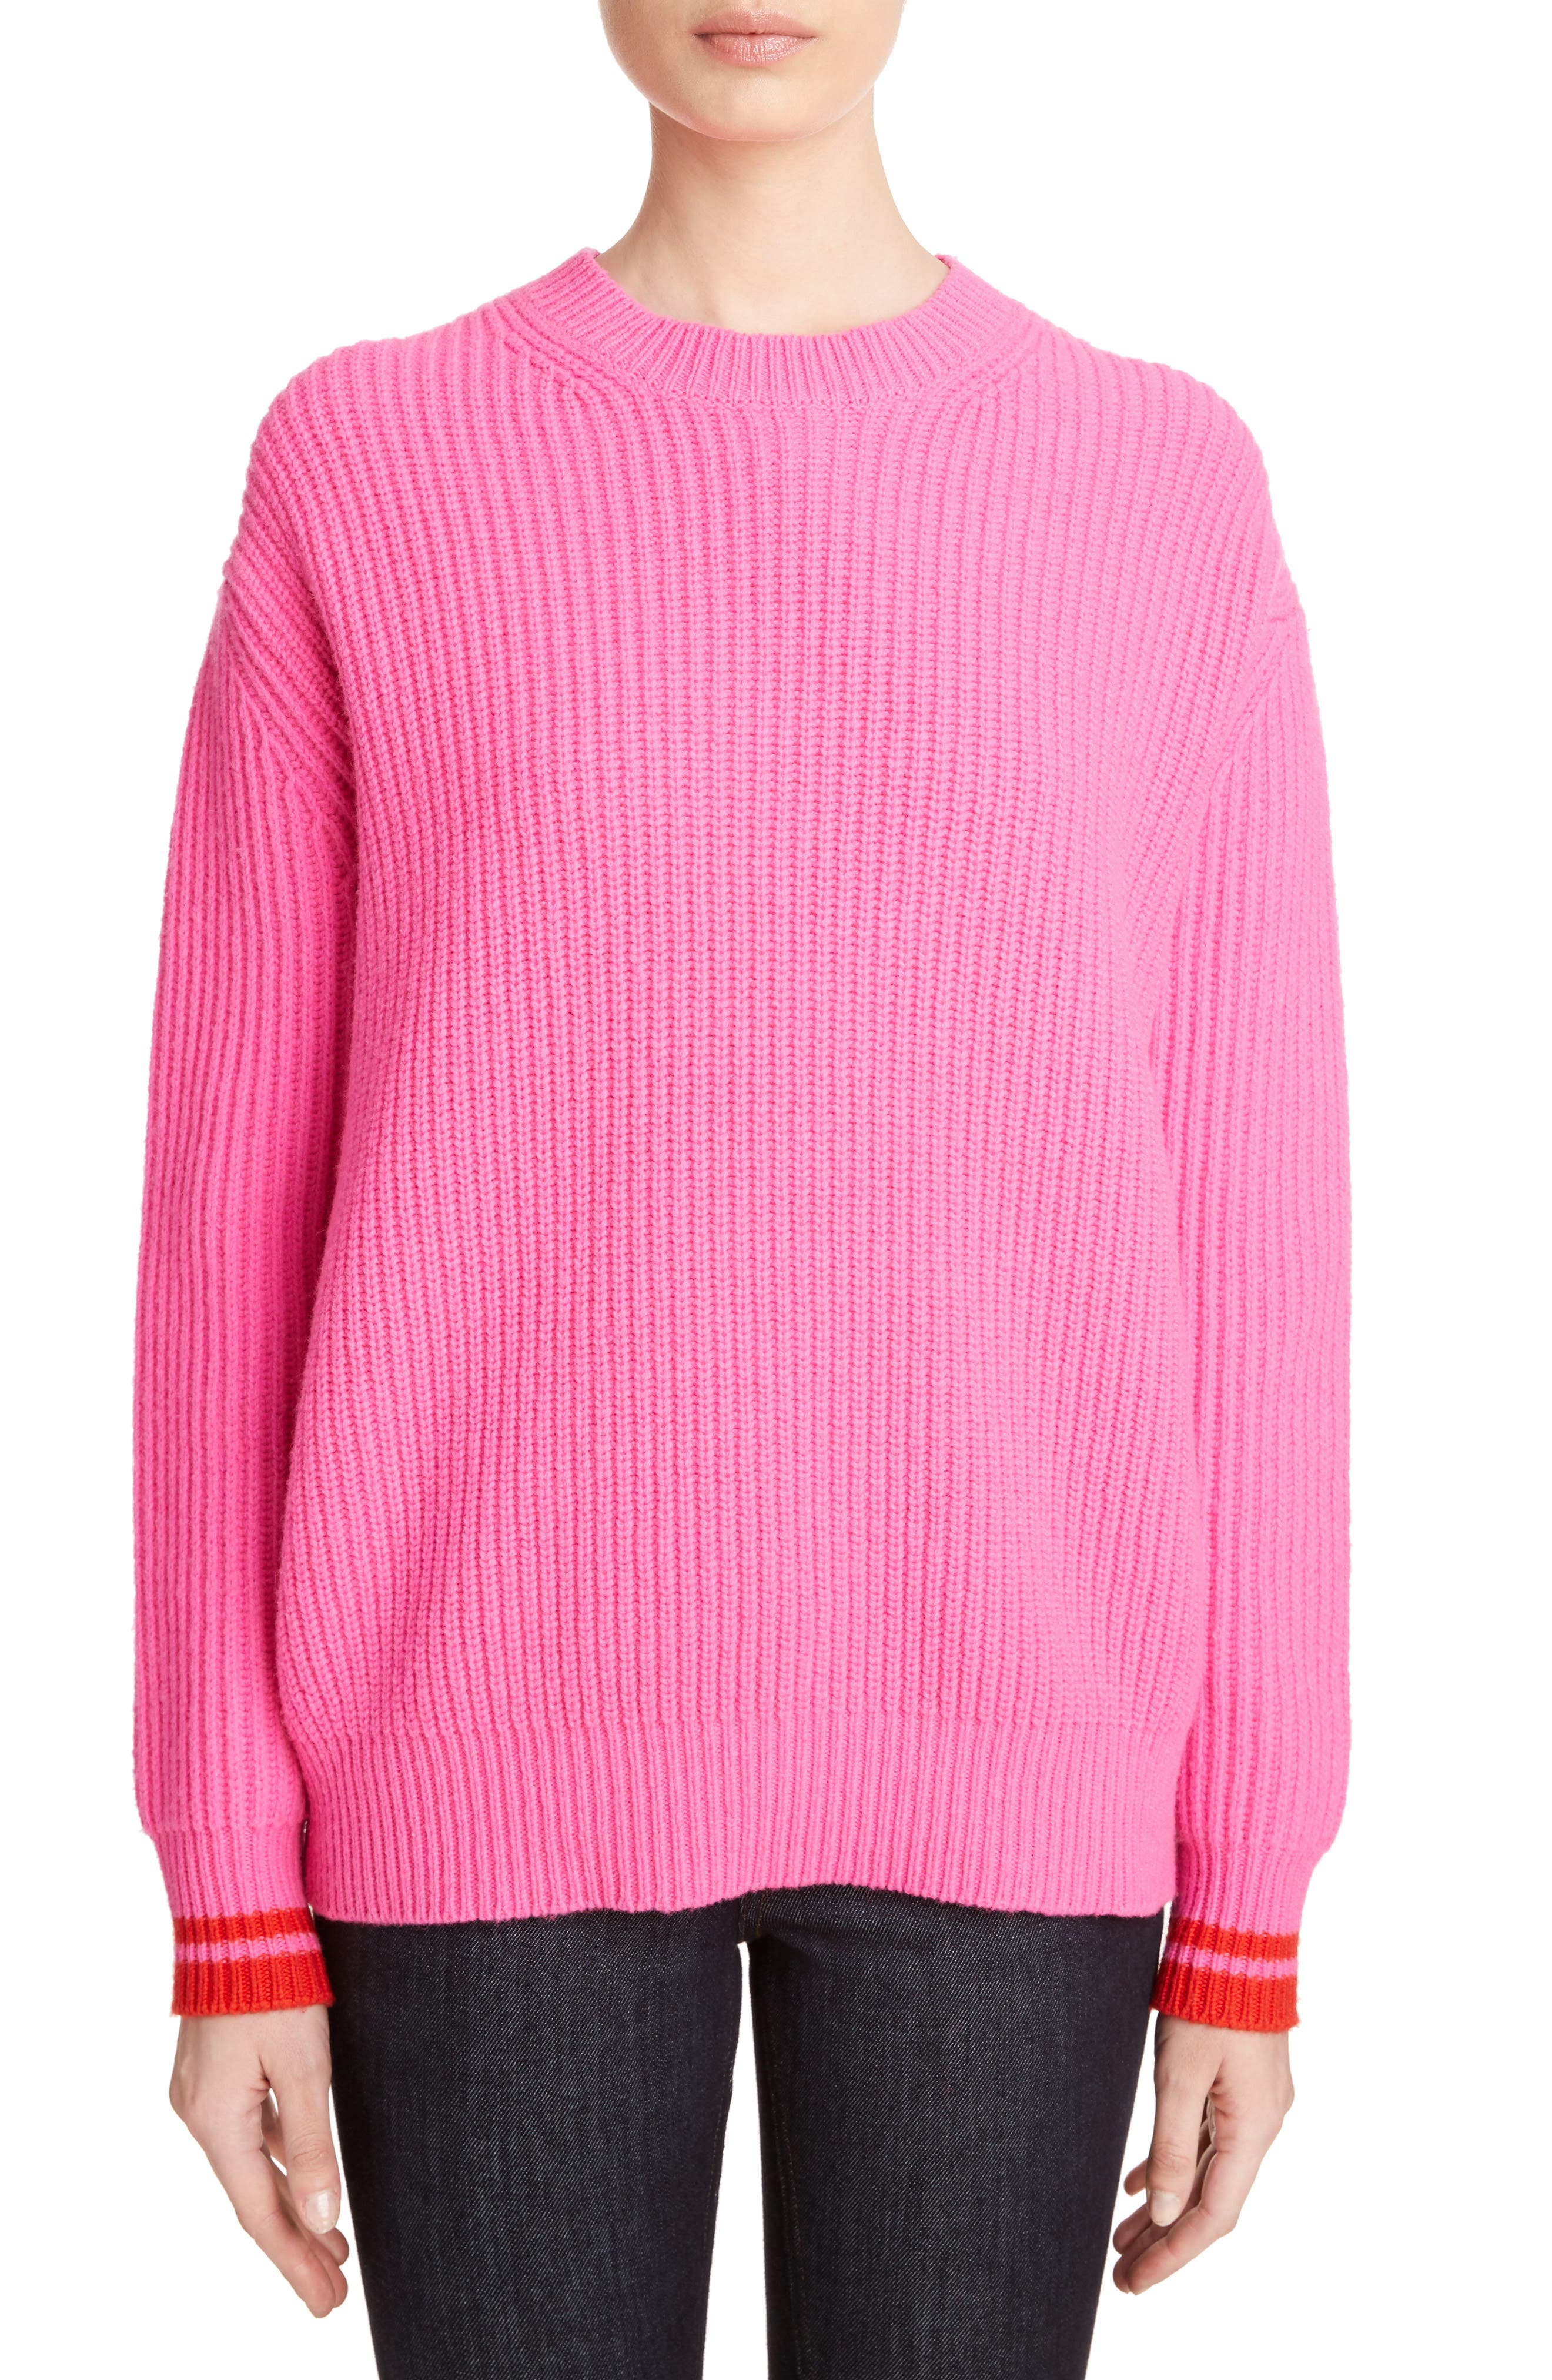 Alternate Image 1 Selected - Victoria, Victoria Beckham Lambswool Boyfriend Sweater